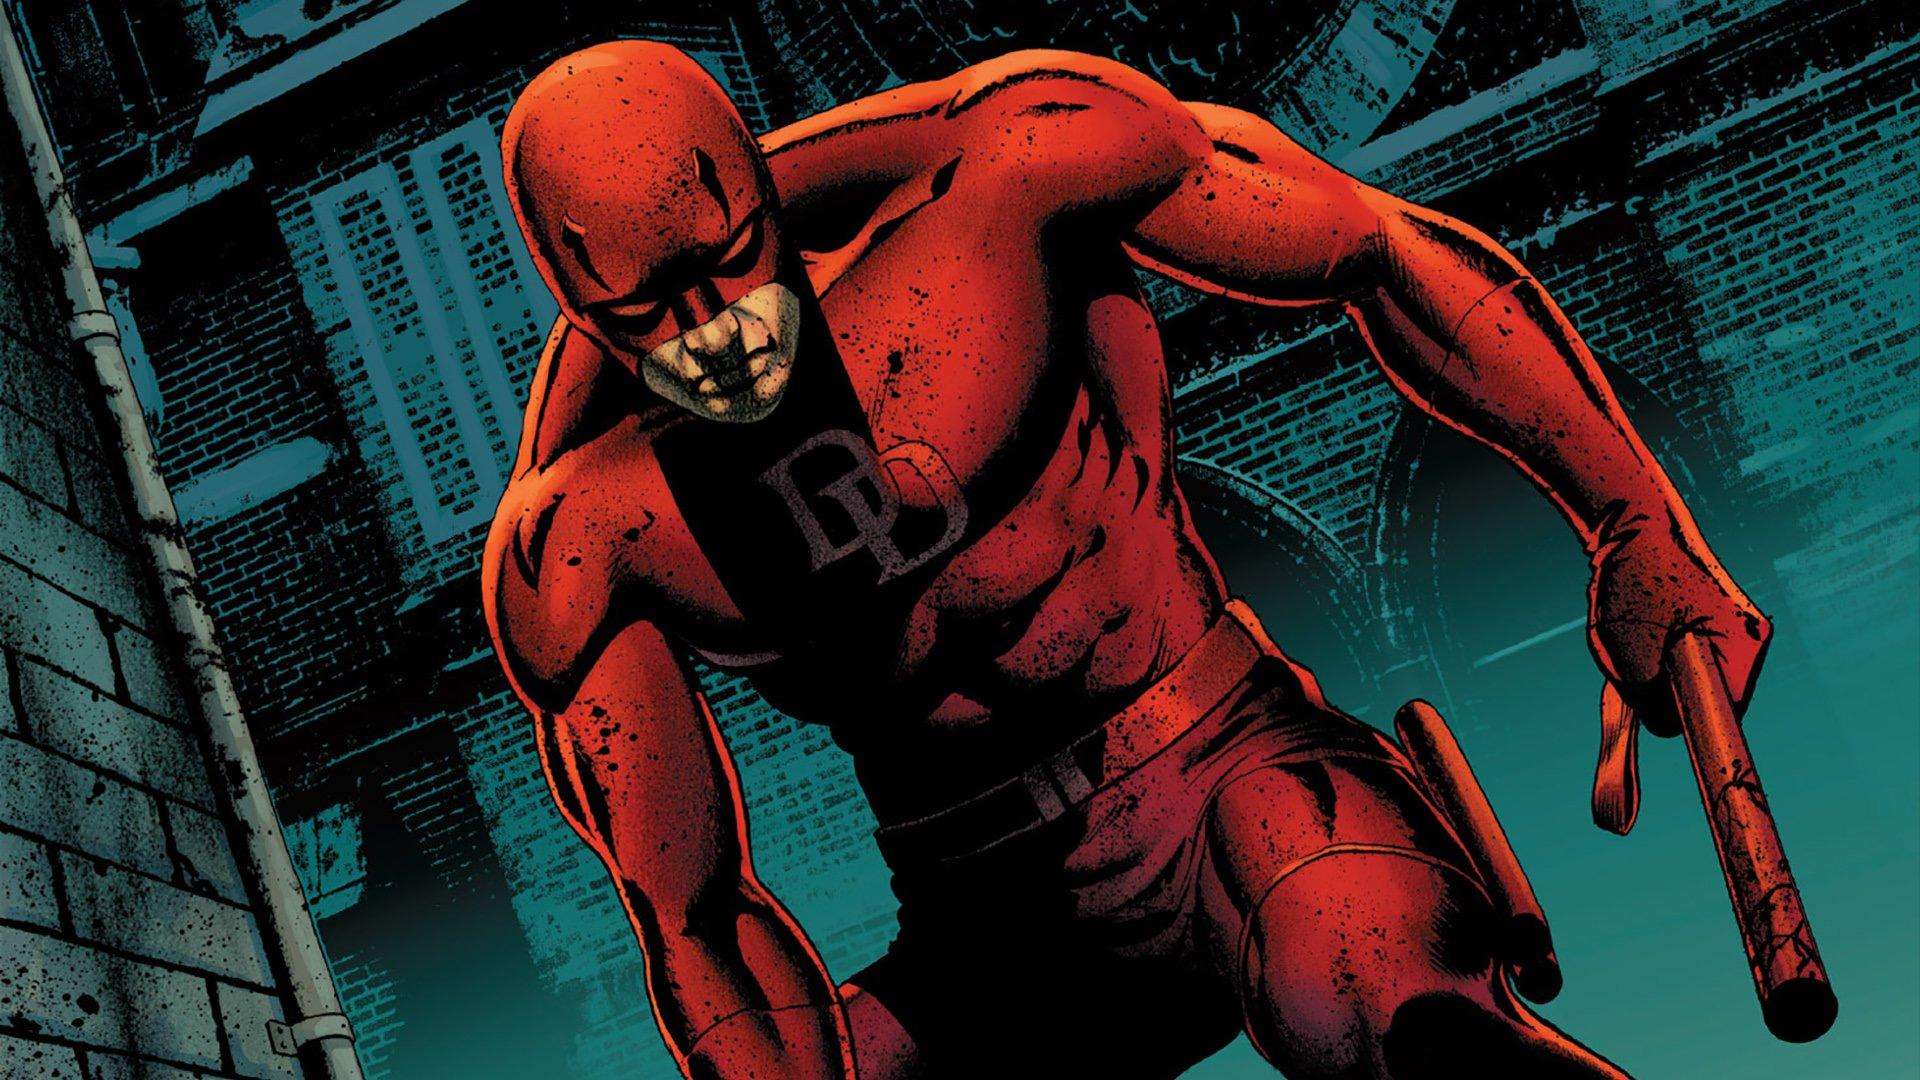 184 Daredevil HD Wallpapers